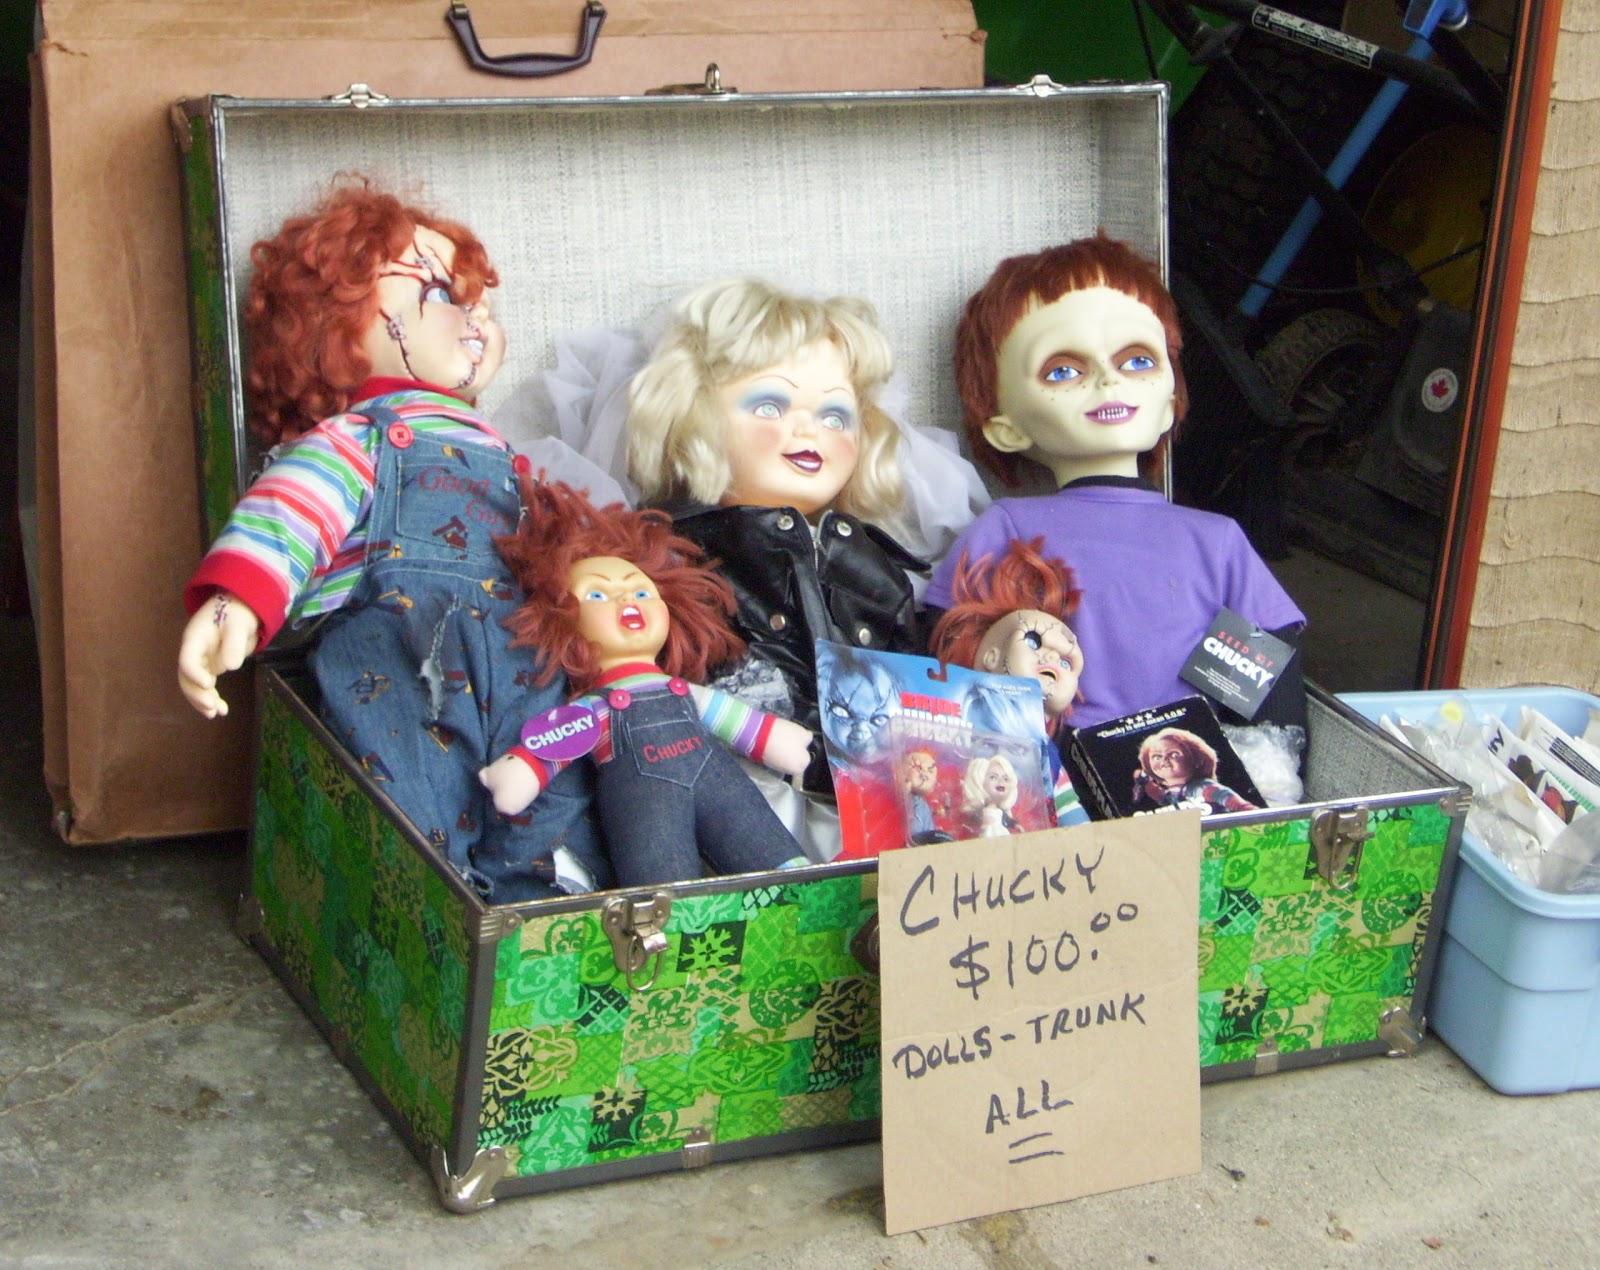 http://2.bp.blogspot.com/_E2PjKGxzTJo/TK45NAF_0HI/AAAAAAAAGN4/xcUnYPciI1g/s1600/Chucky+Dolls.JPG